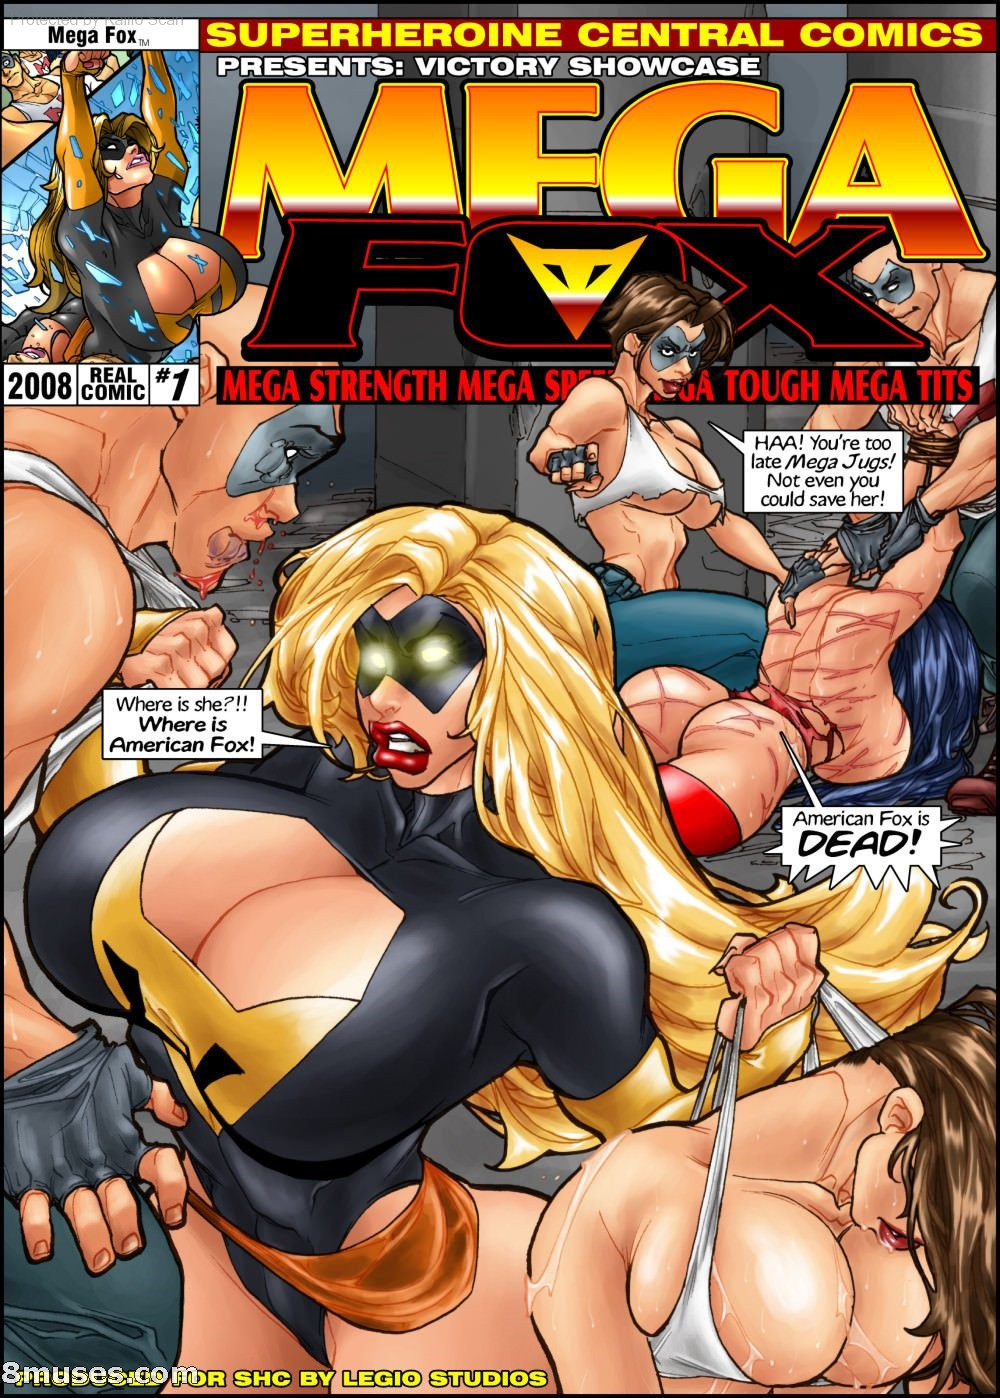 Mega Fox Issue 1 Title Image